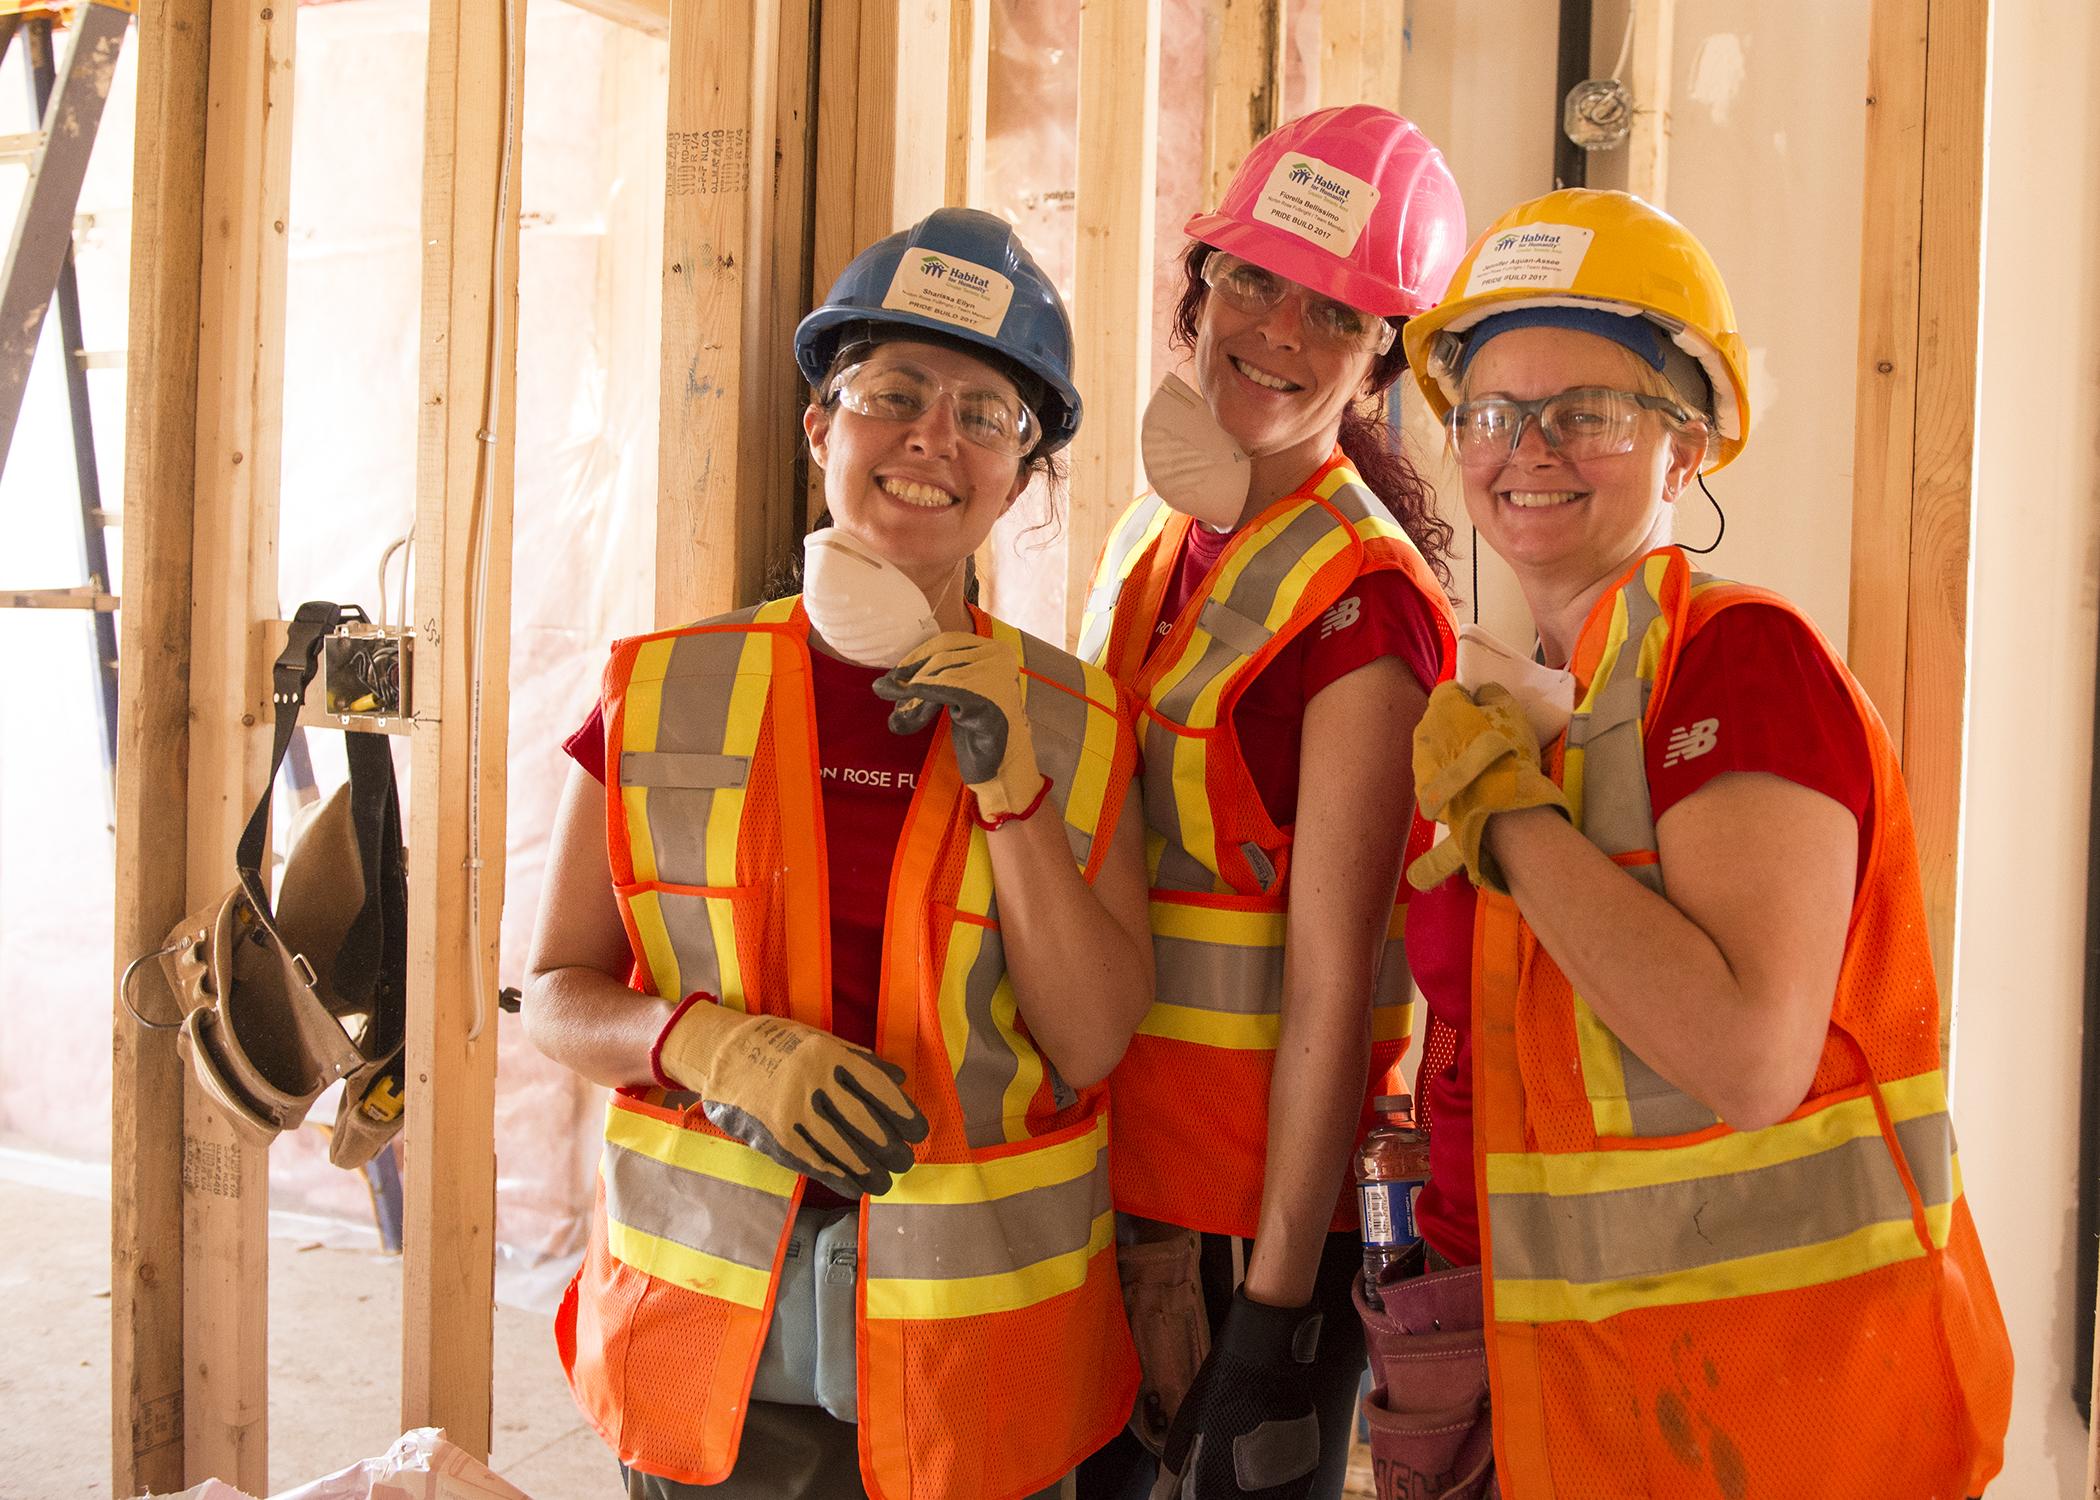 Norton Rose Fulbright Pride Build Week